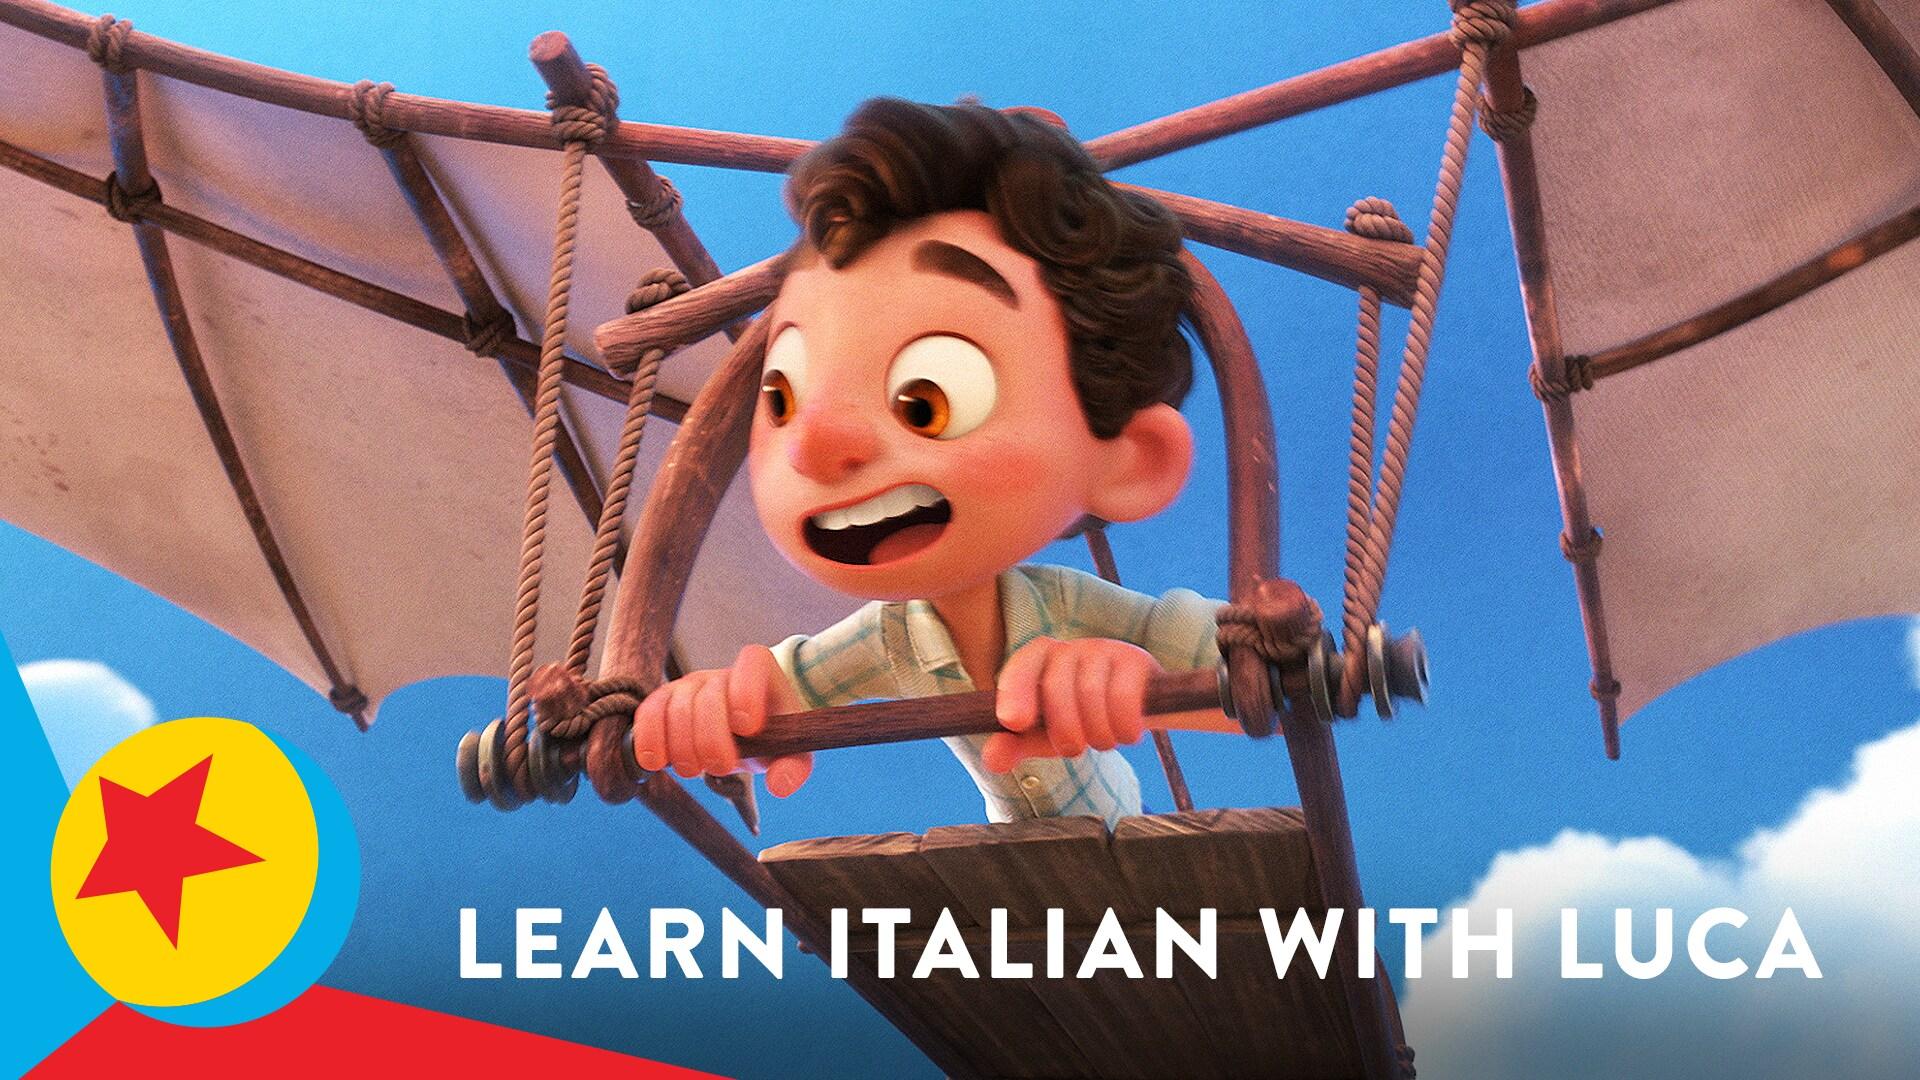 Learn Italian with Luca! | Pixar